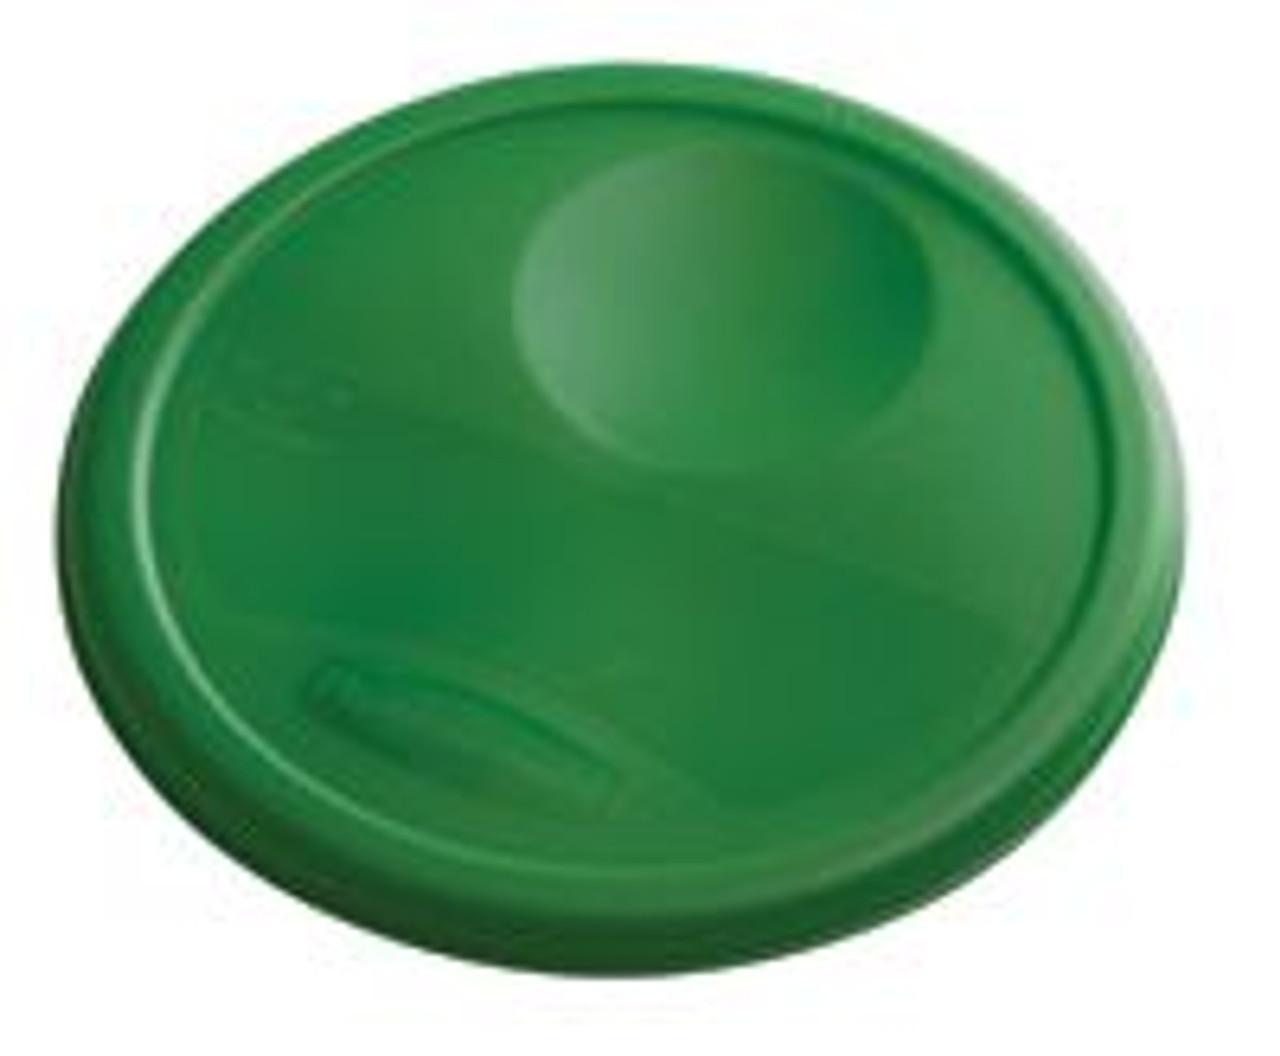 Rubbermaid Round Container Lid - Medium Green - 1980381